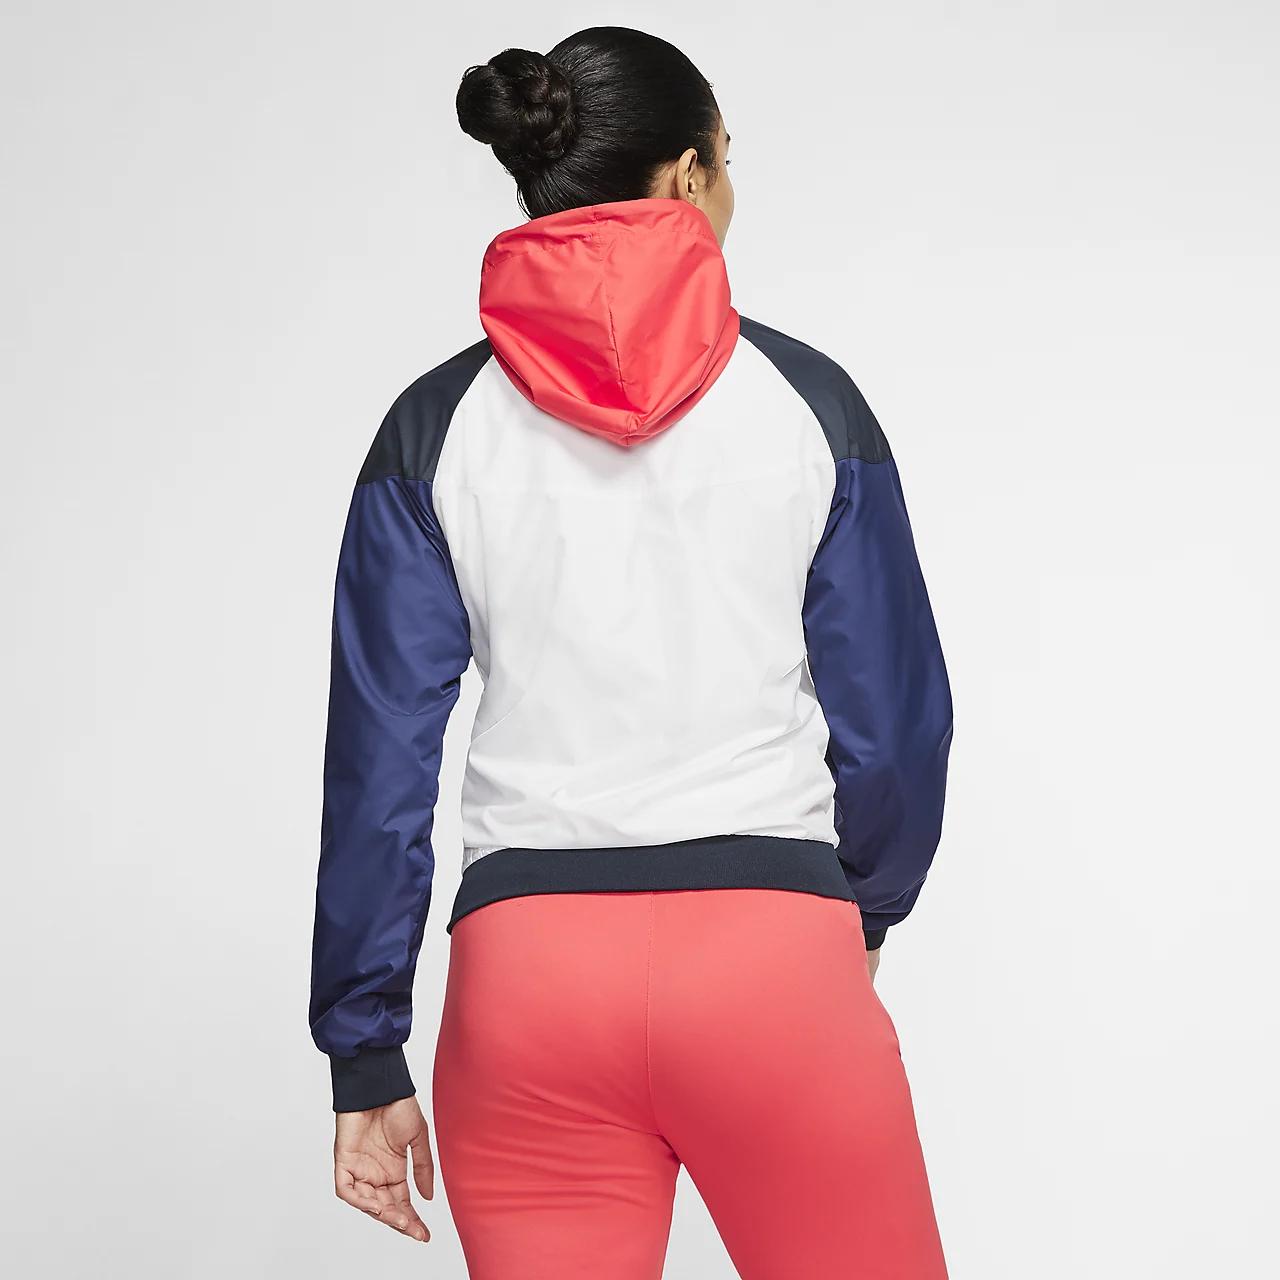 U.S. Windrunner Women's Jacket CI8407-100